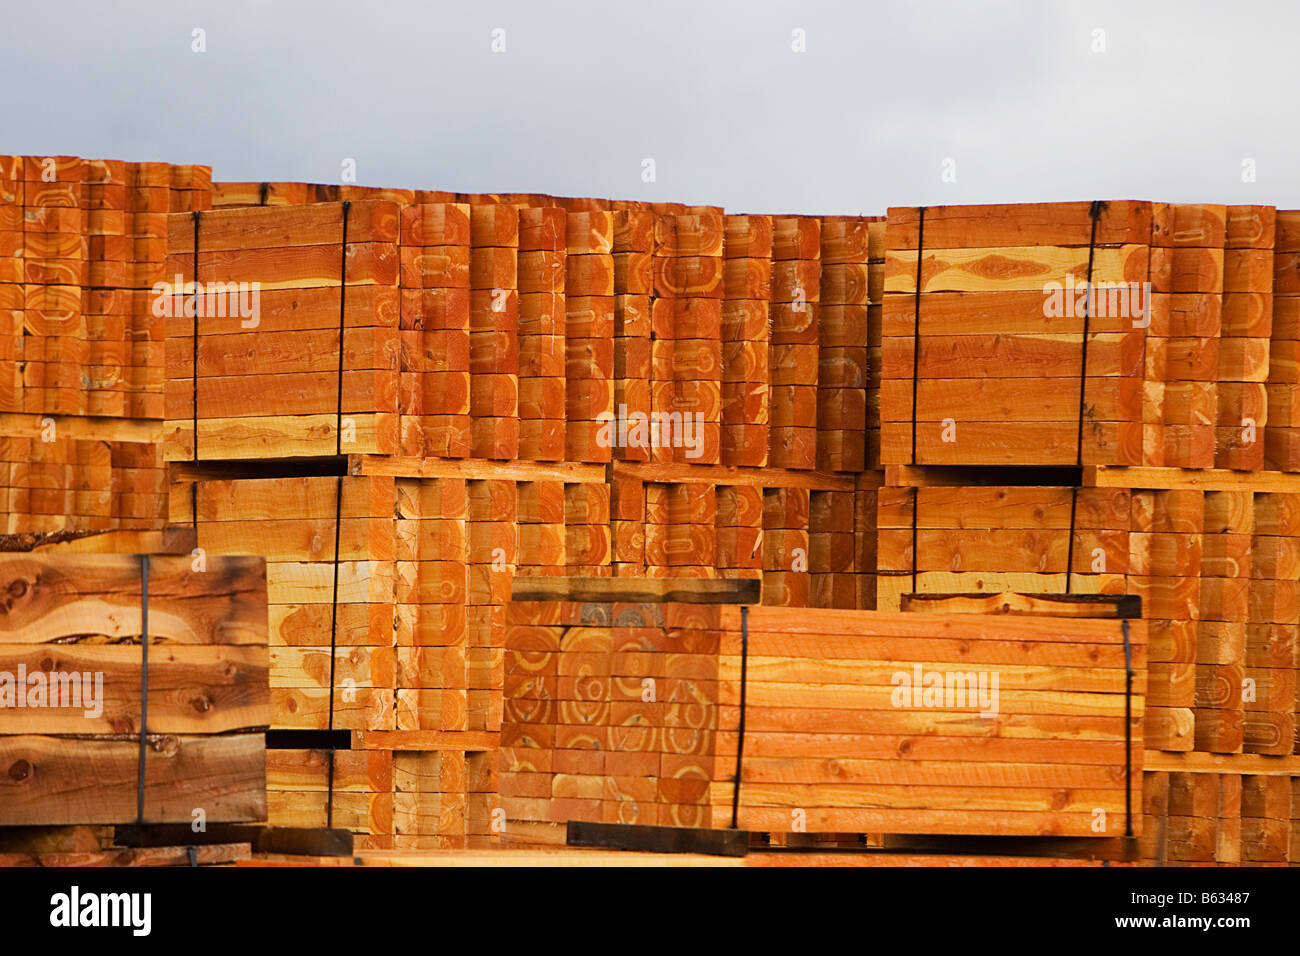 Stacks of timbers in a lumberyard - Stock Image